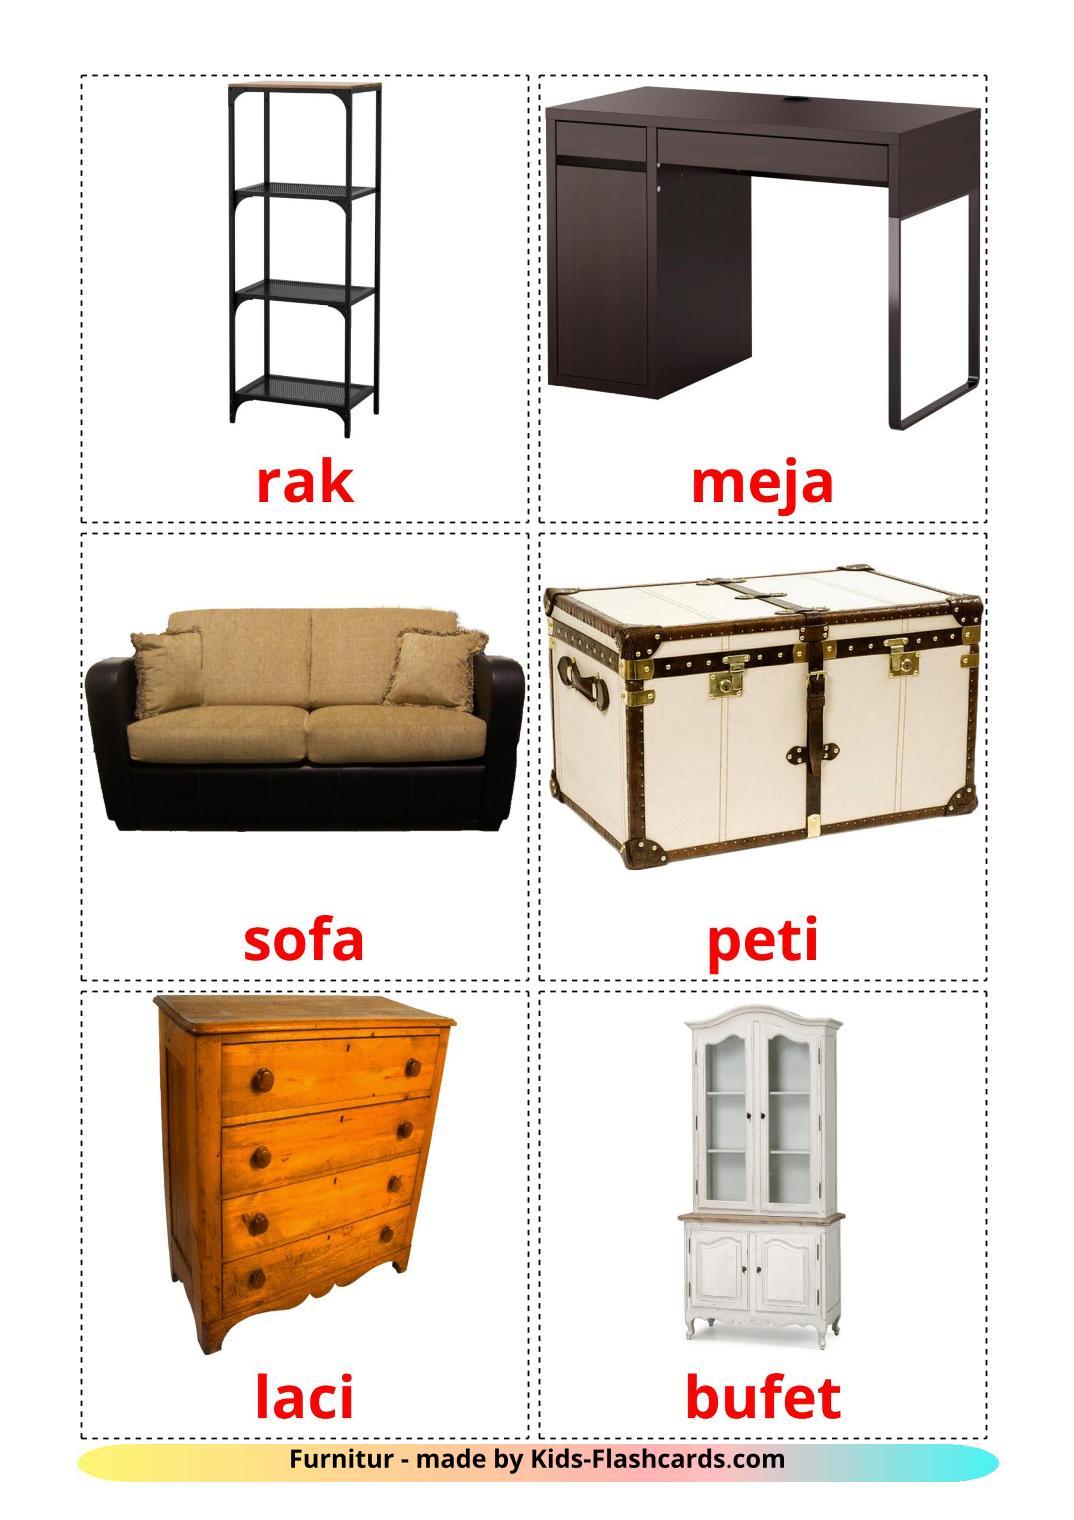 Furniture - 31 Free Printable indonesian Flashcards